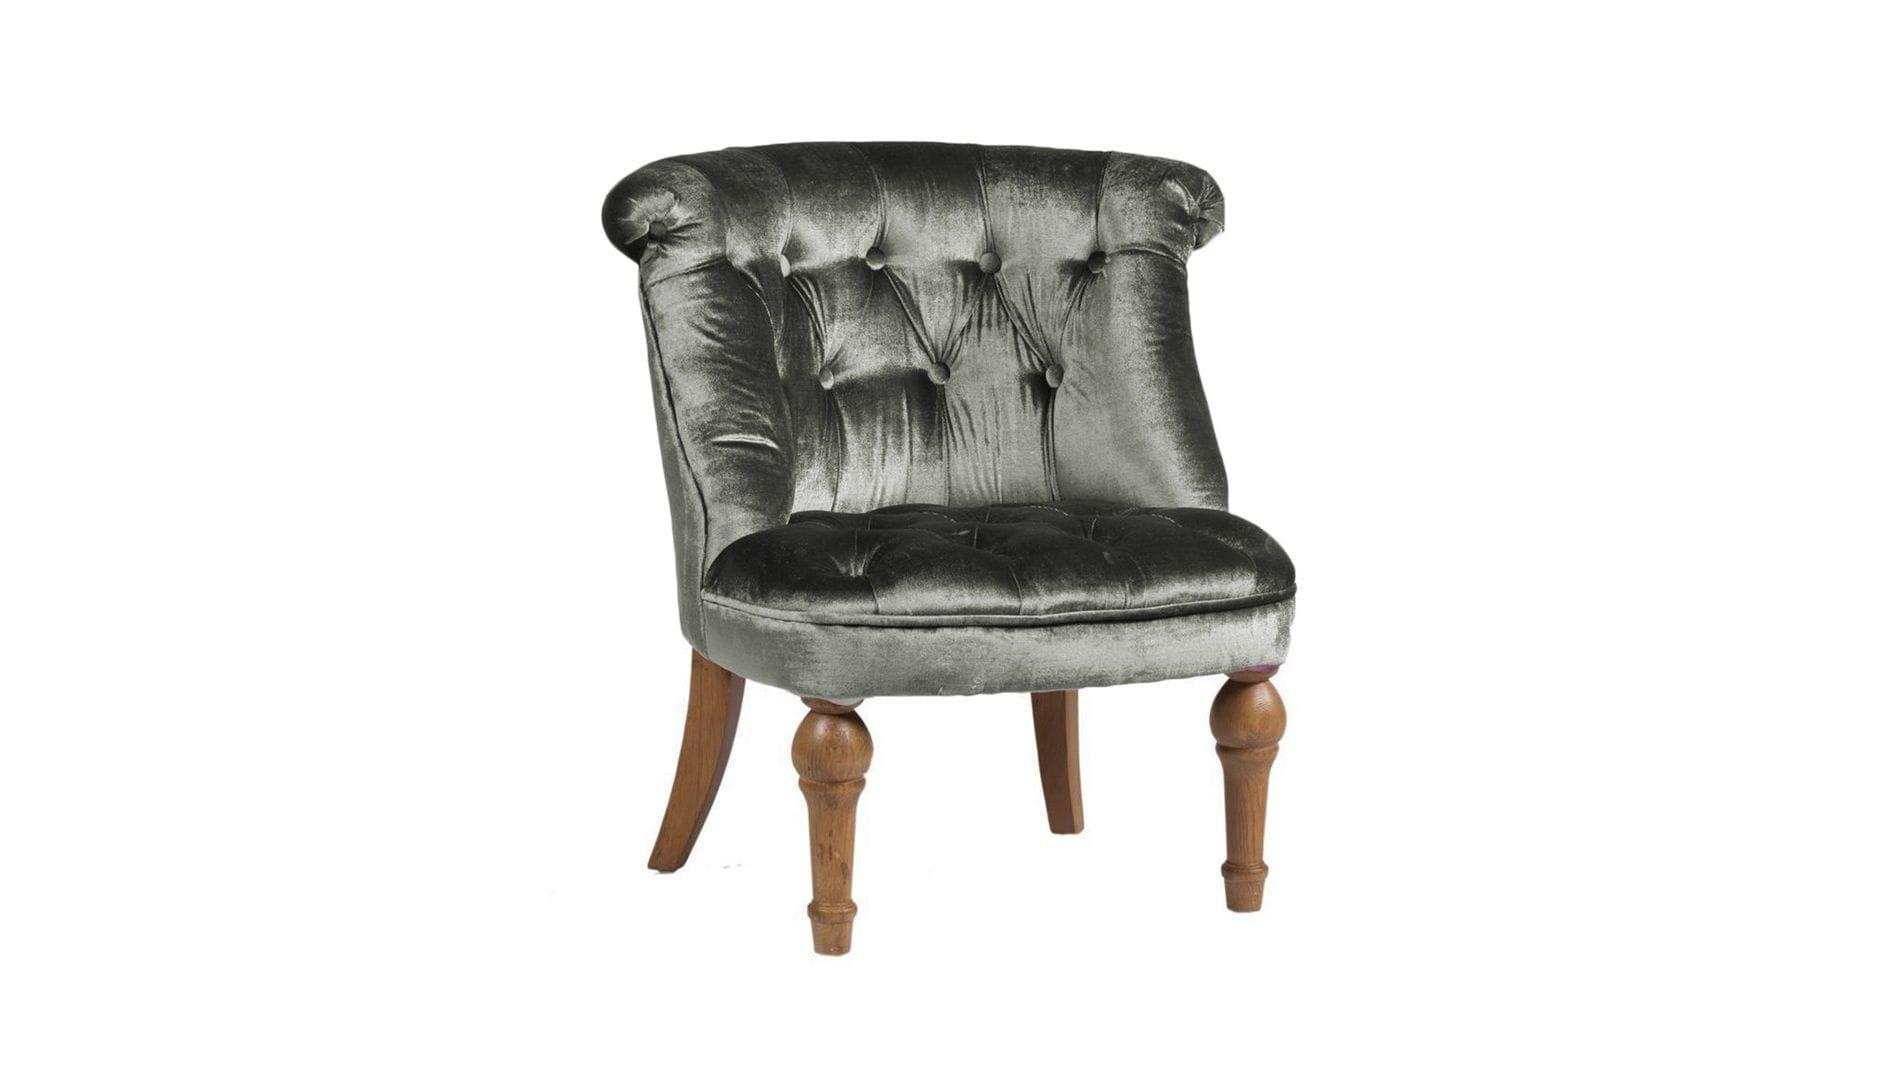 Кресло Sophie Tufted Slipper Chair Серый Микровелюр М